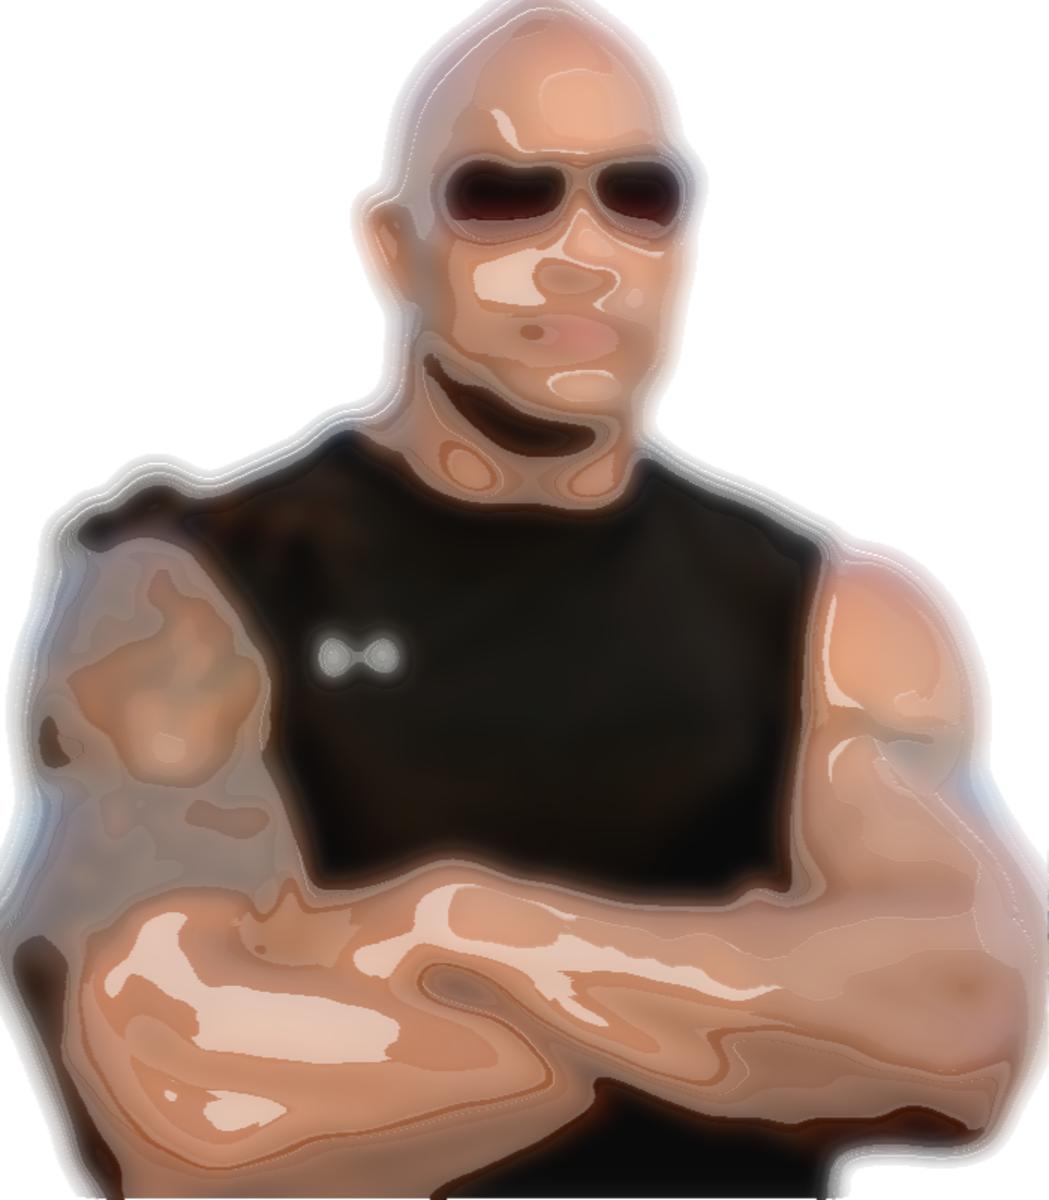 Dwayne Johnson ASCII picture with liquid blur effect.